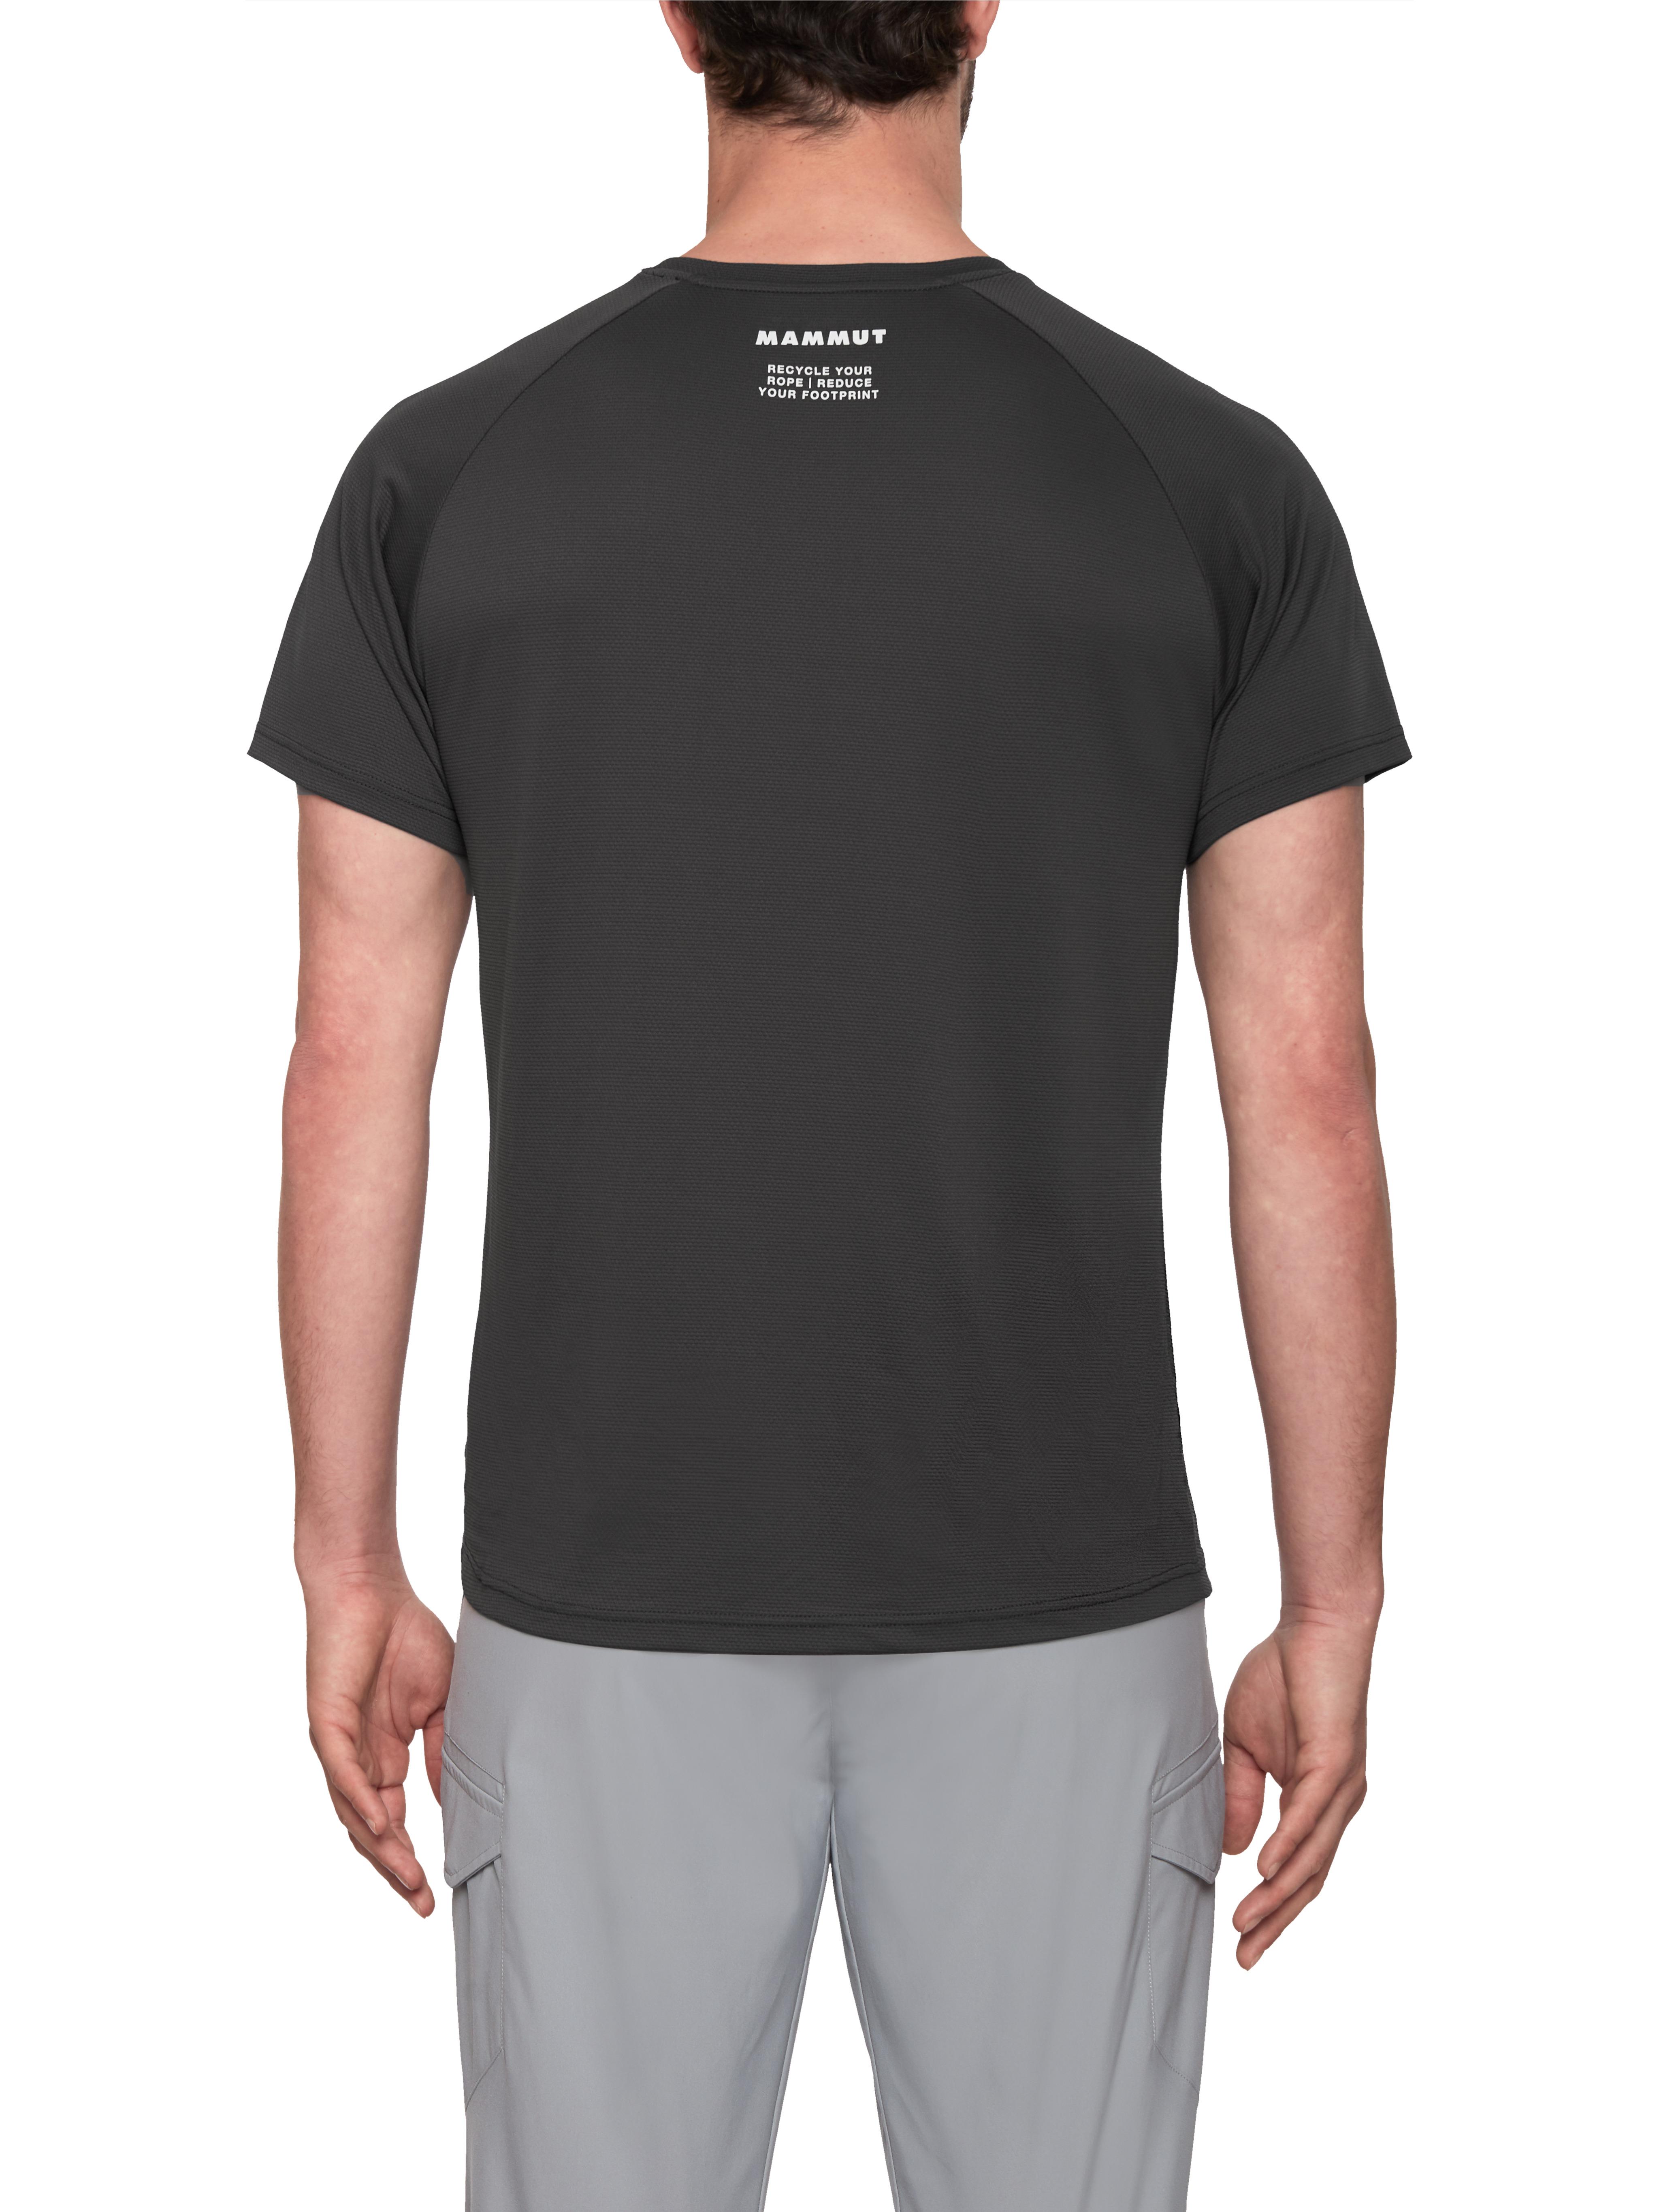 Close The Loop T-Shirt Men 2.0 product image